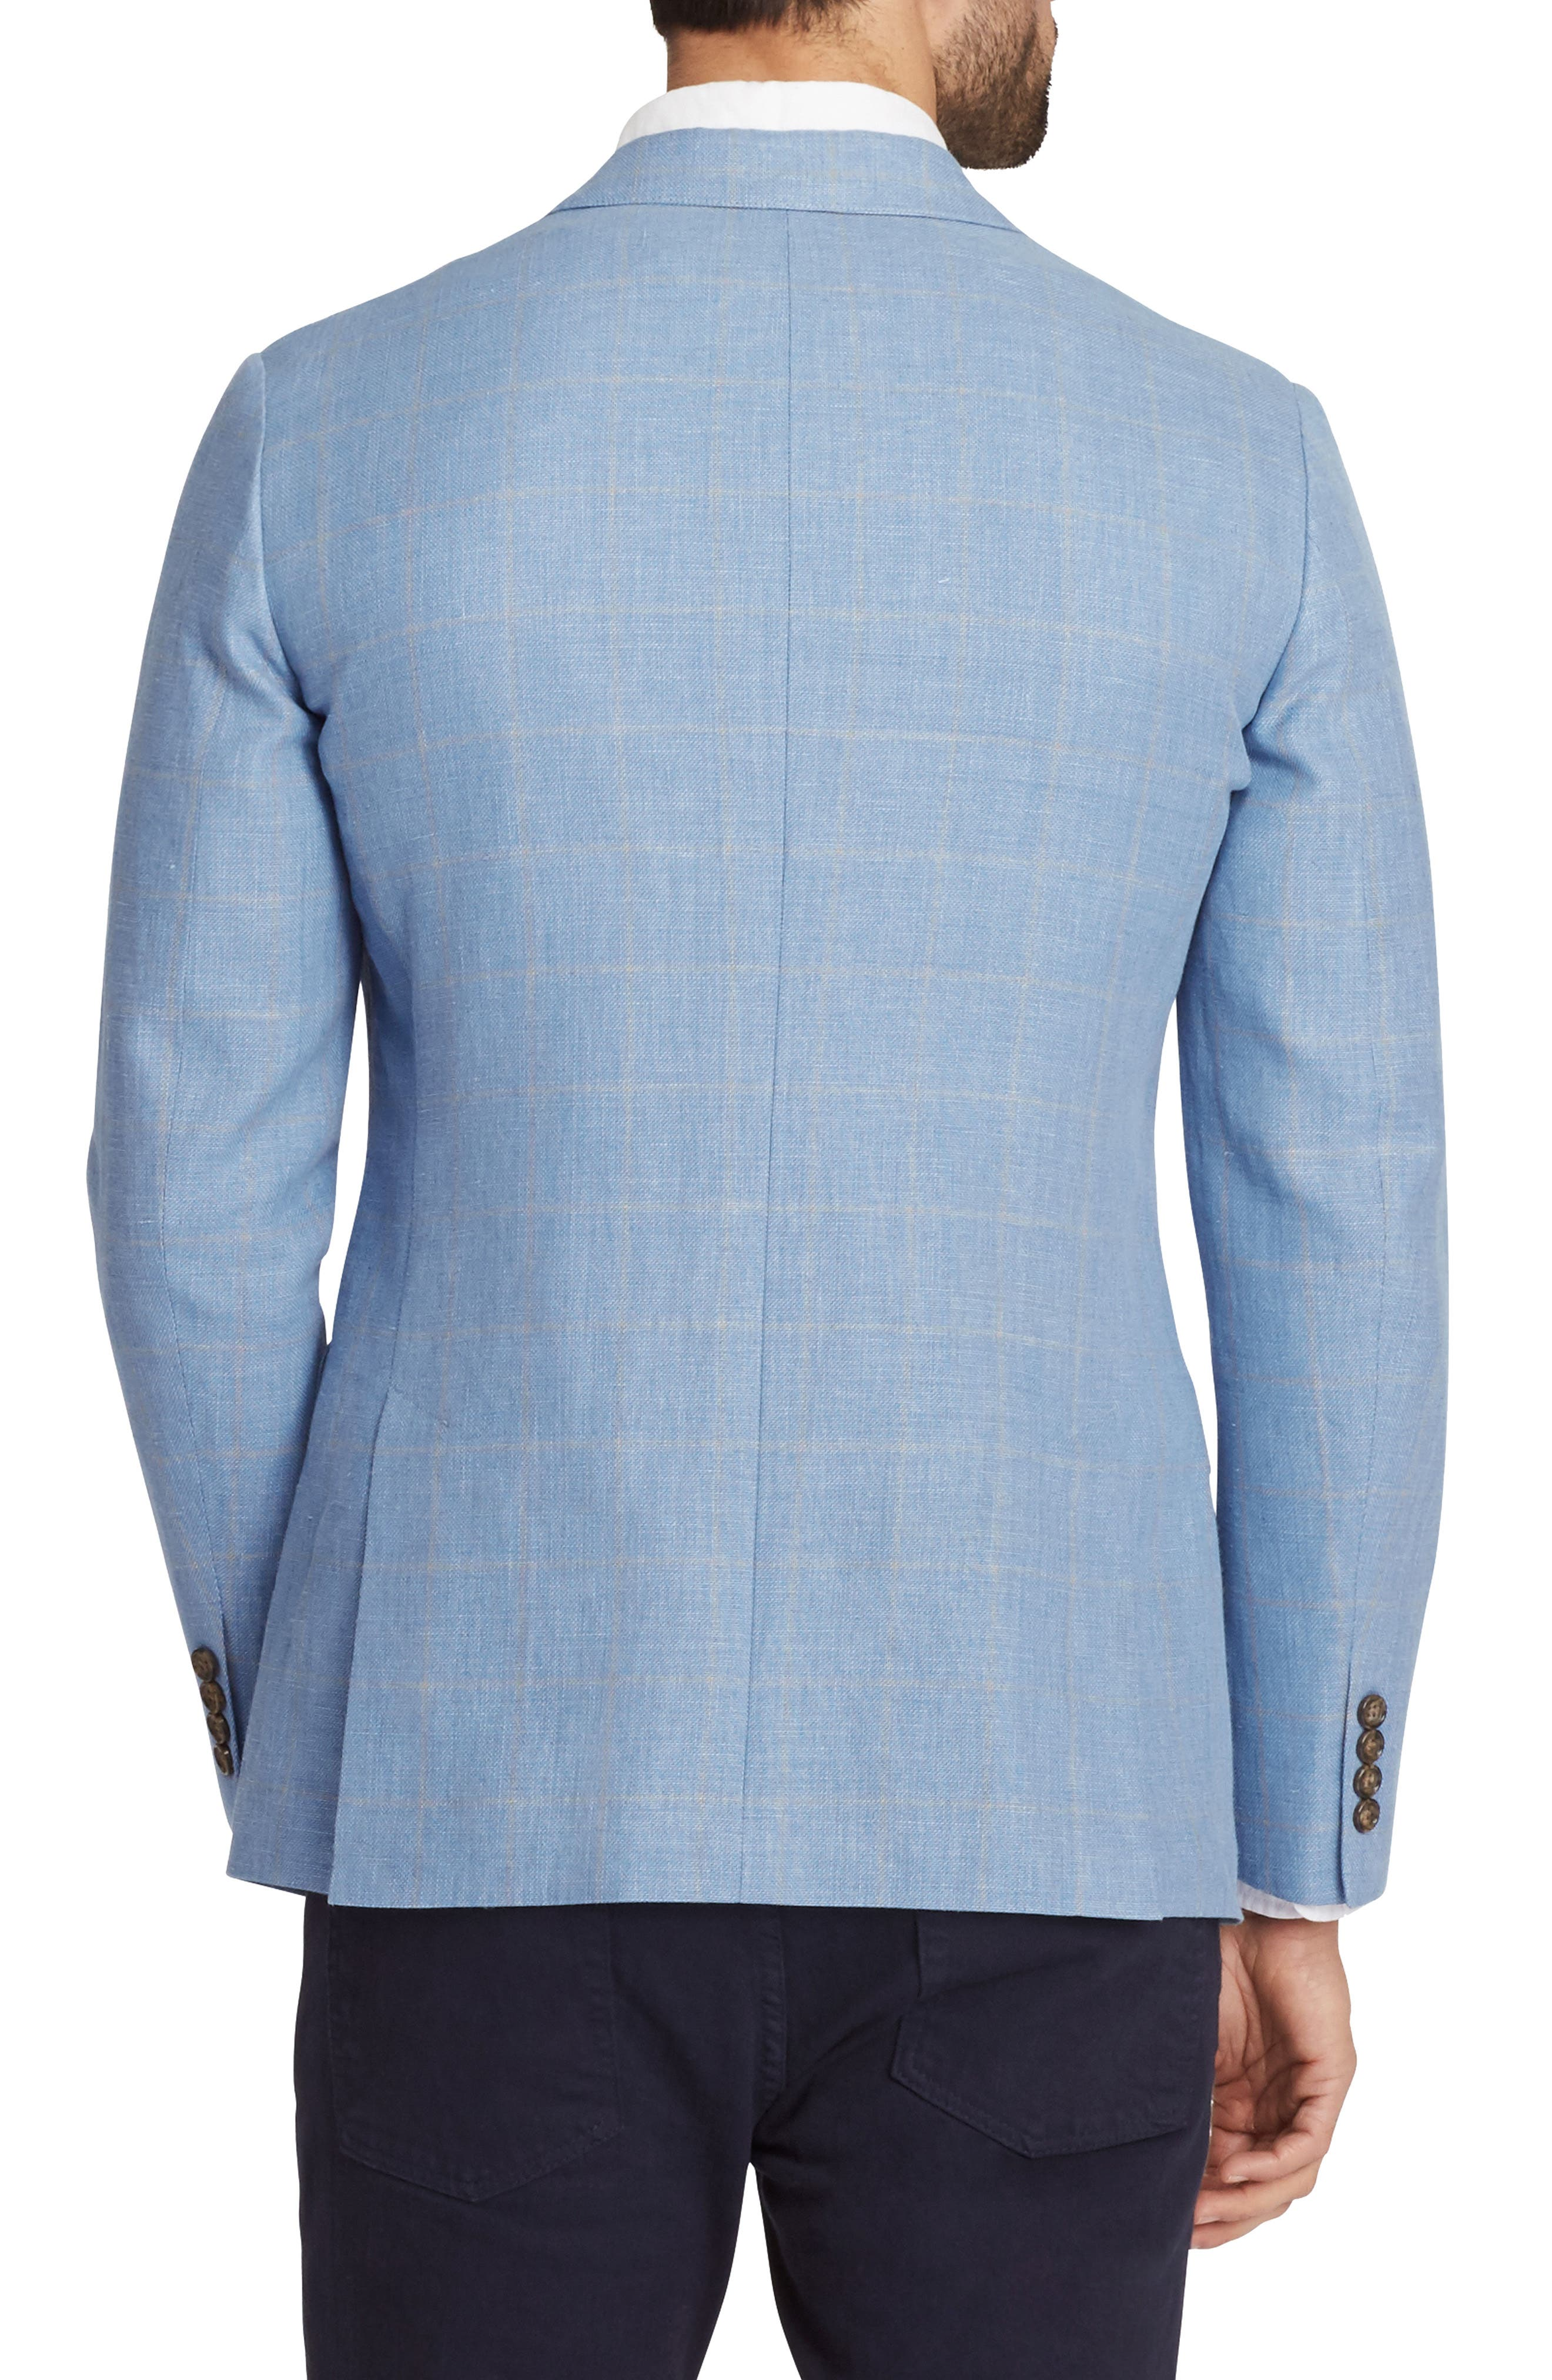 Alternate Image 2  - Bonobos Slim Fit Cotton & Linen Unconstructed Blazer